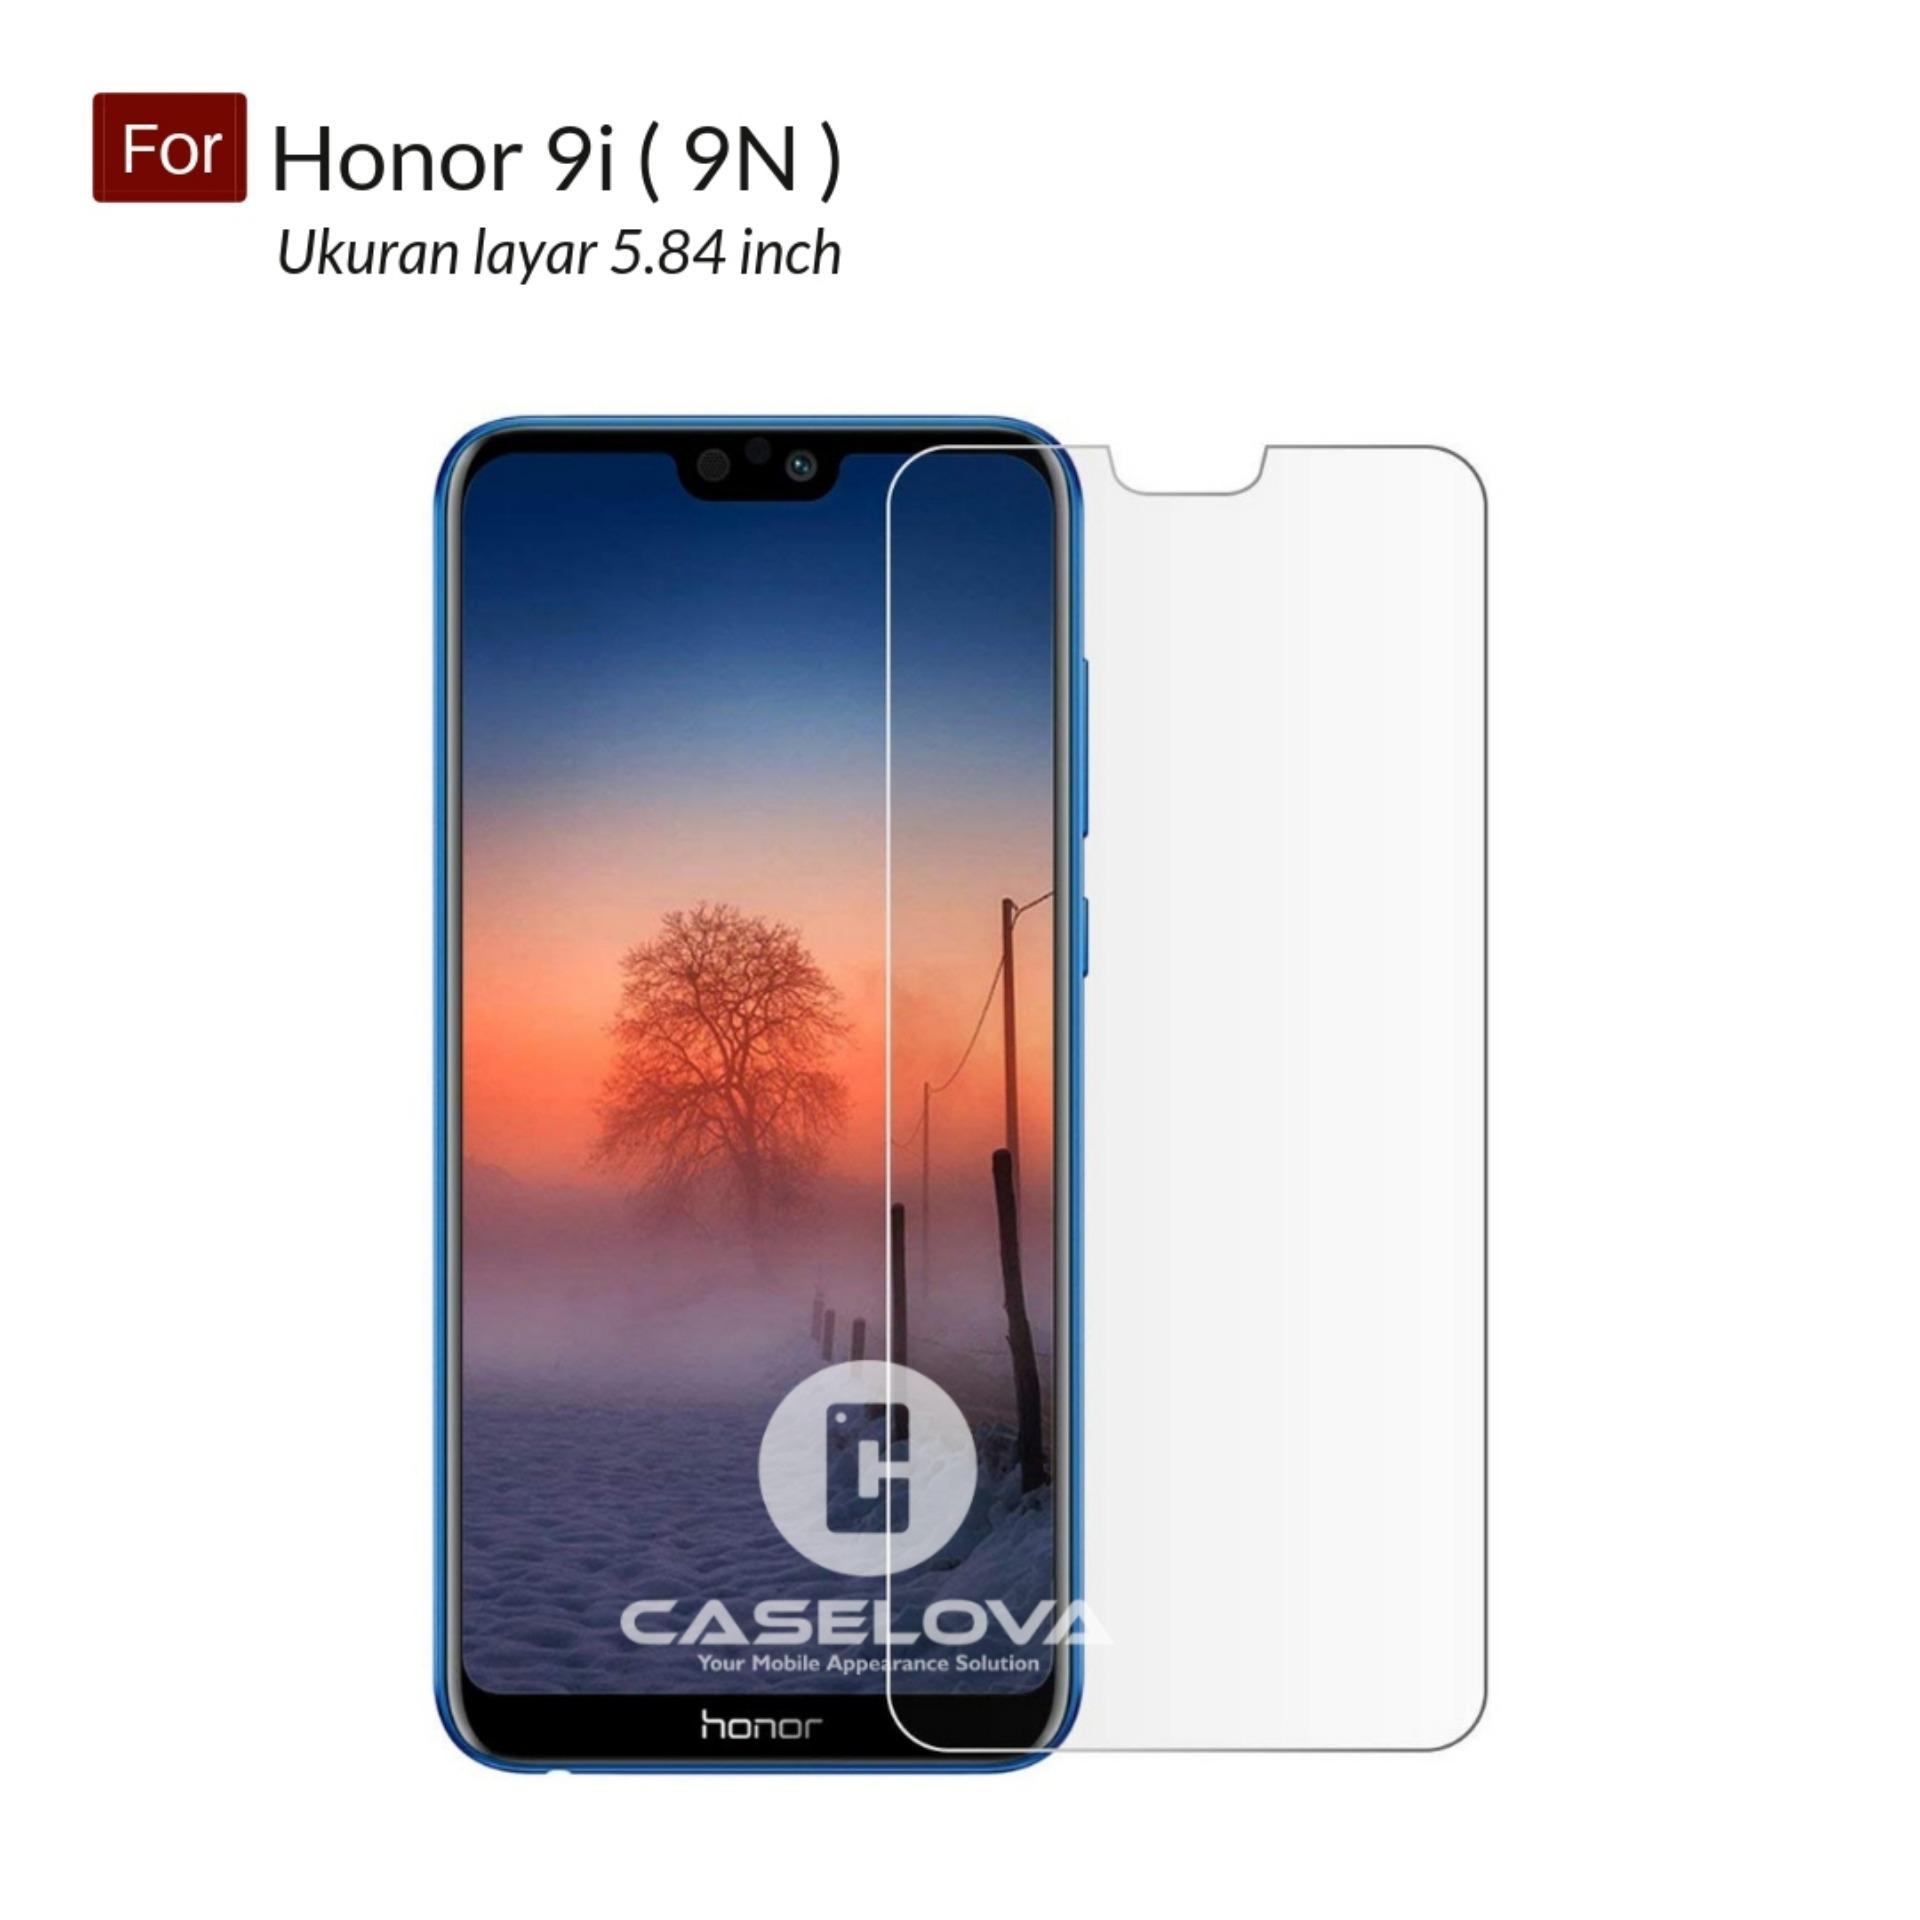 Pelindung Layar Handphone Tablet Tempered Glass Xiaomi Redmi Note 5 5d Full Cover Ambigo Acc Screen